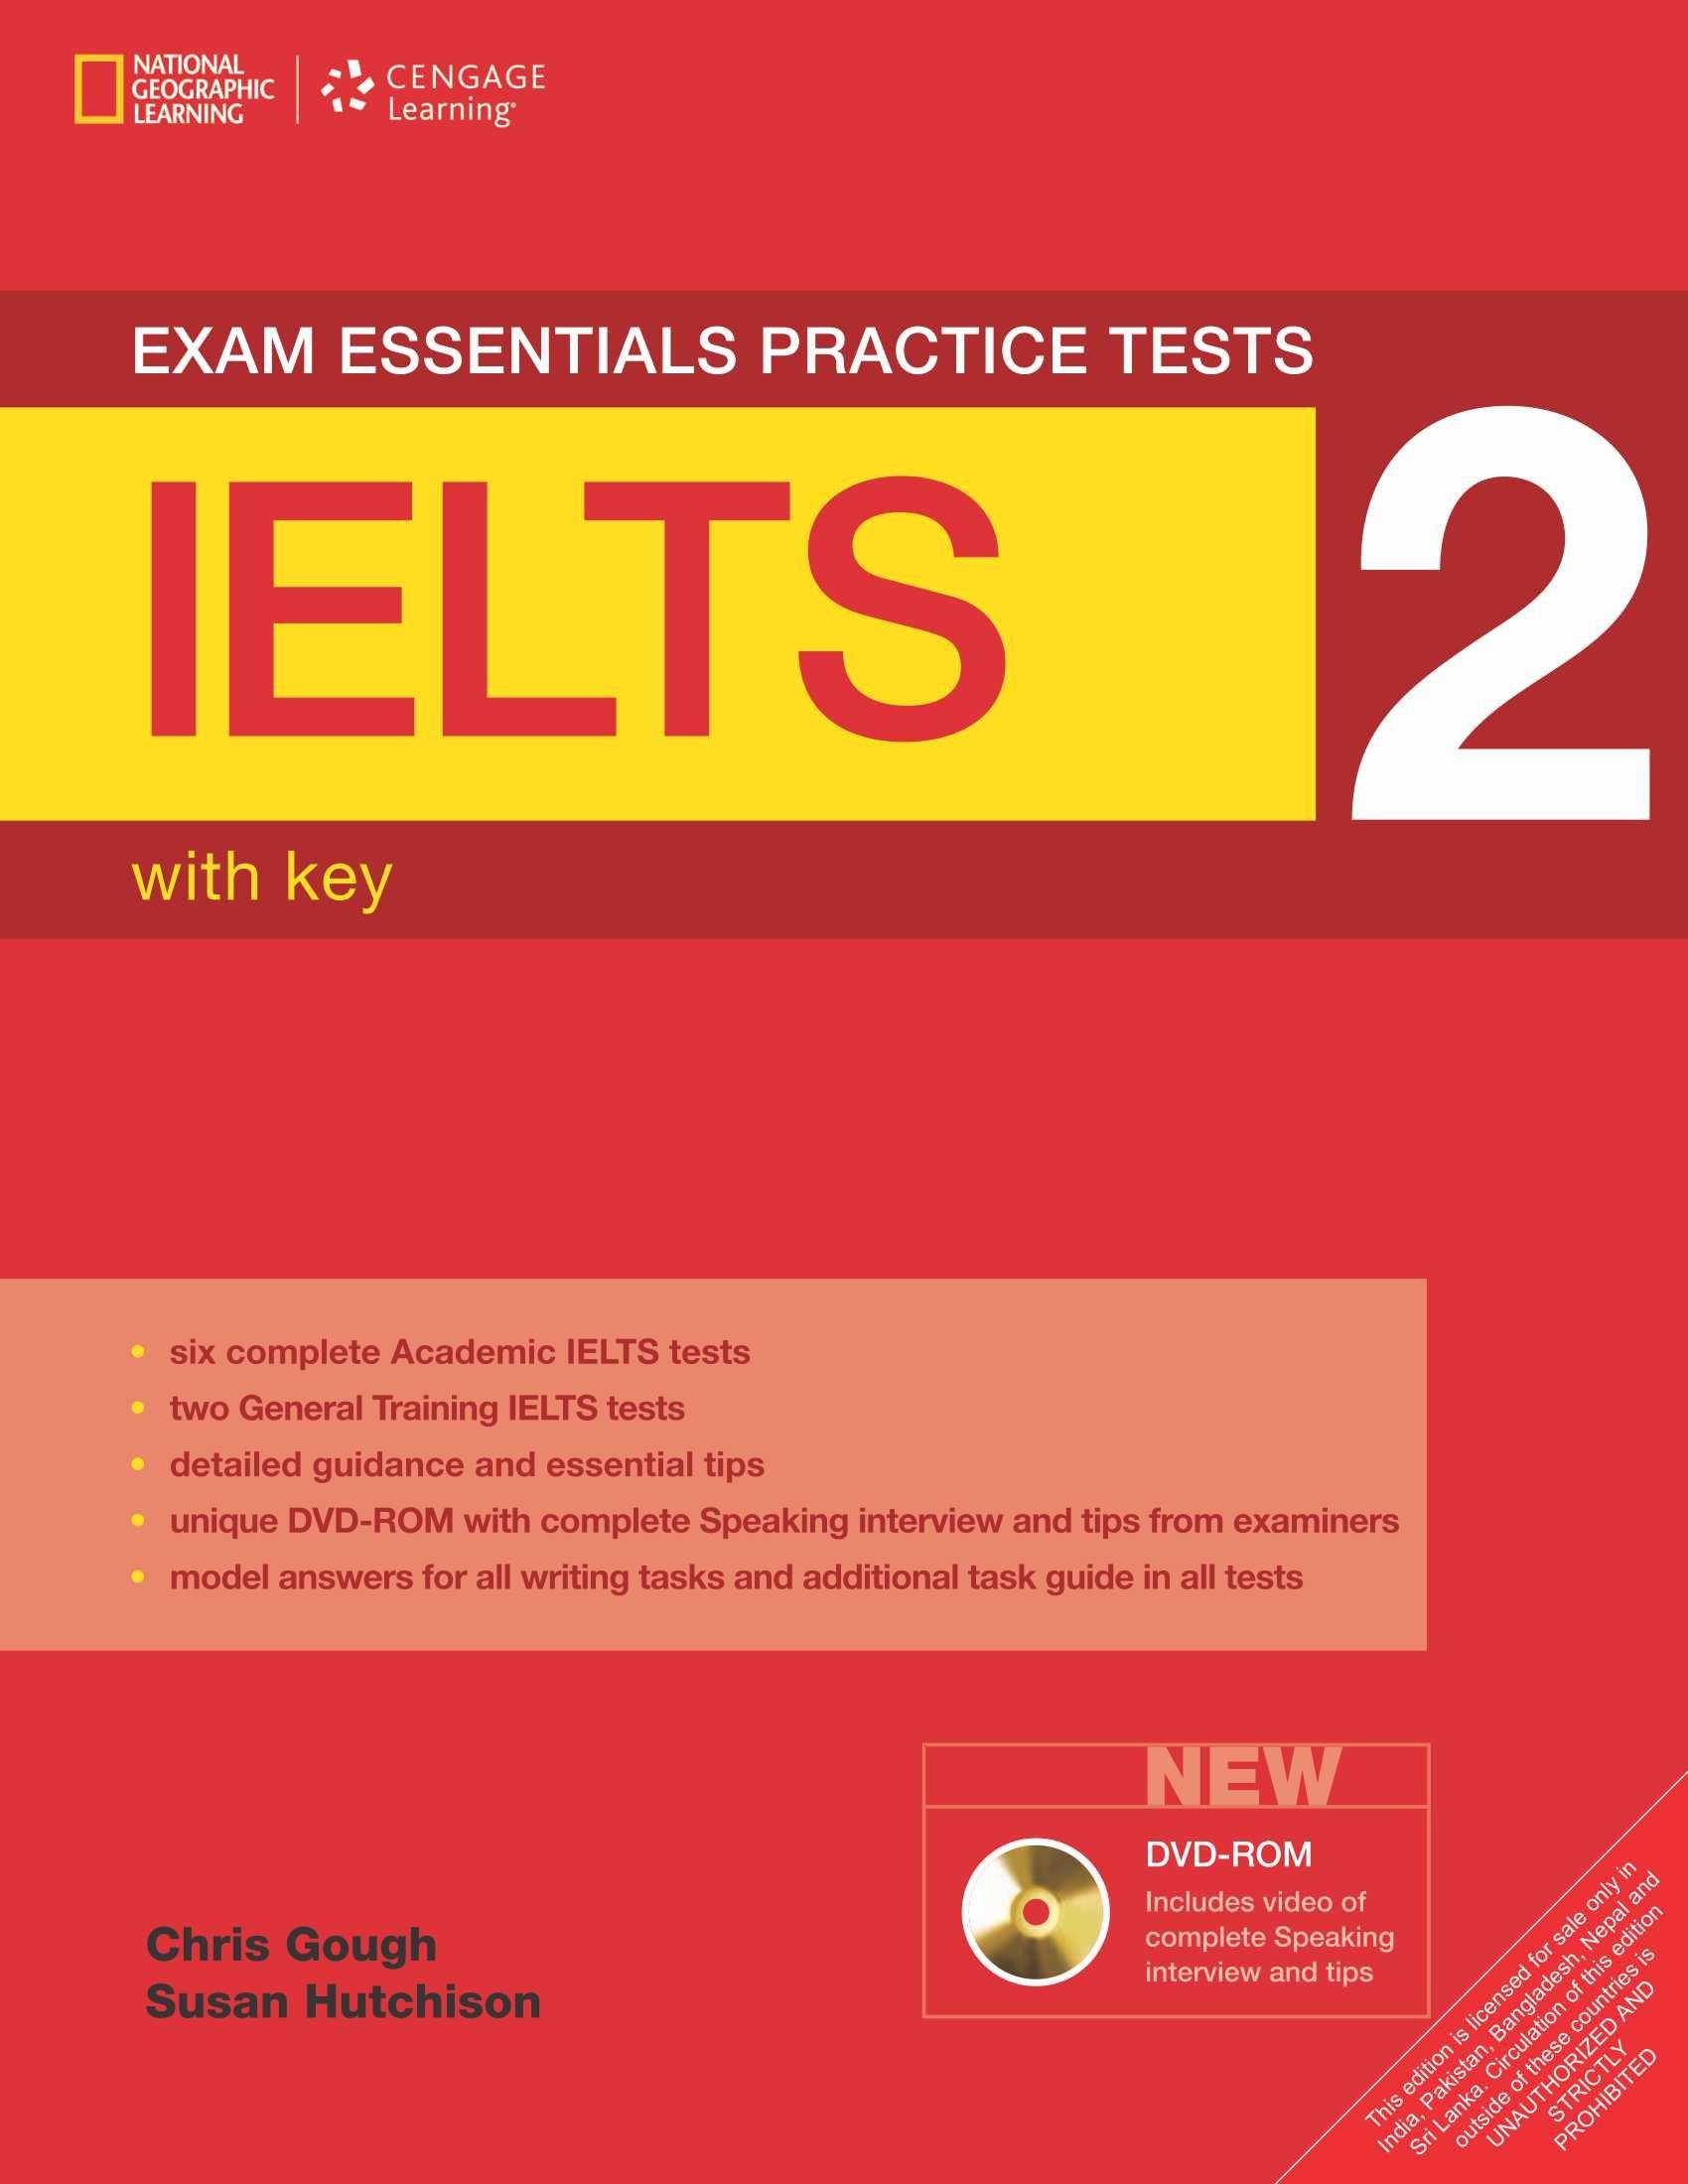 Exam essentials ielts practice test 1 with key (pdf + audio.